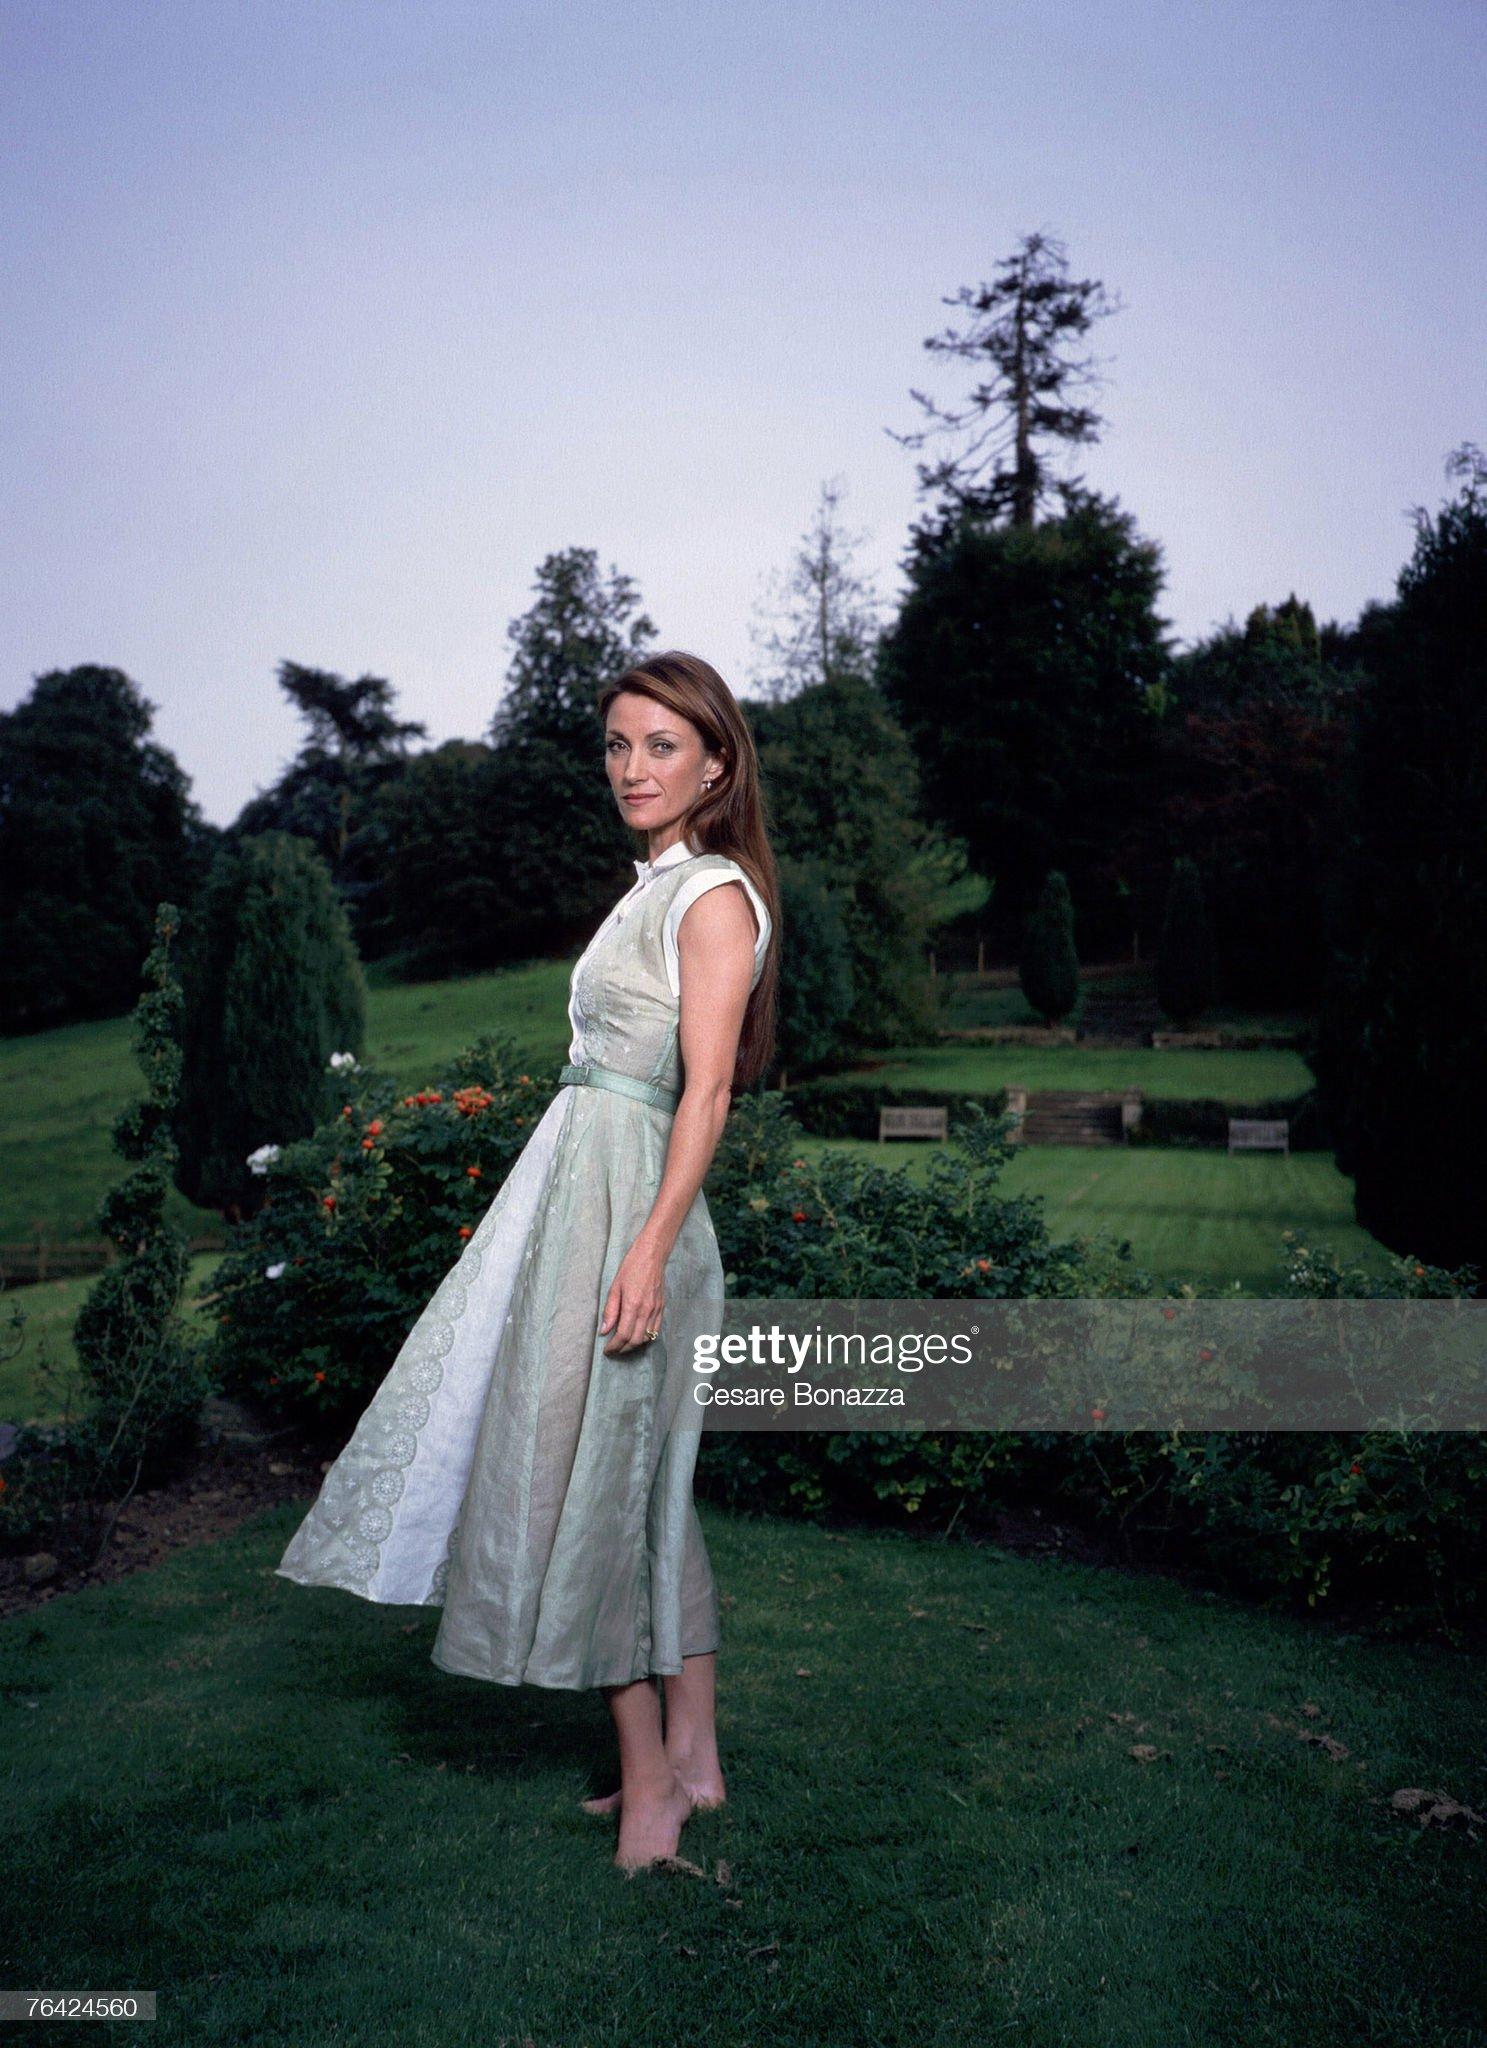 https://media.gettyimages.com/photos/jane-seymour-jane-seymour-photo-shoot-in-bath-england-bath-england-picture-id76424560?s=2048x2048